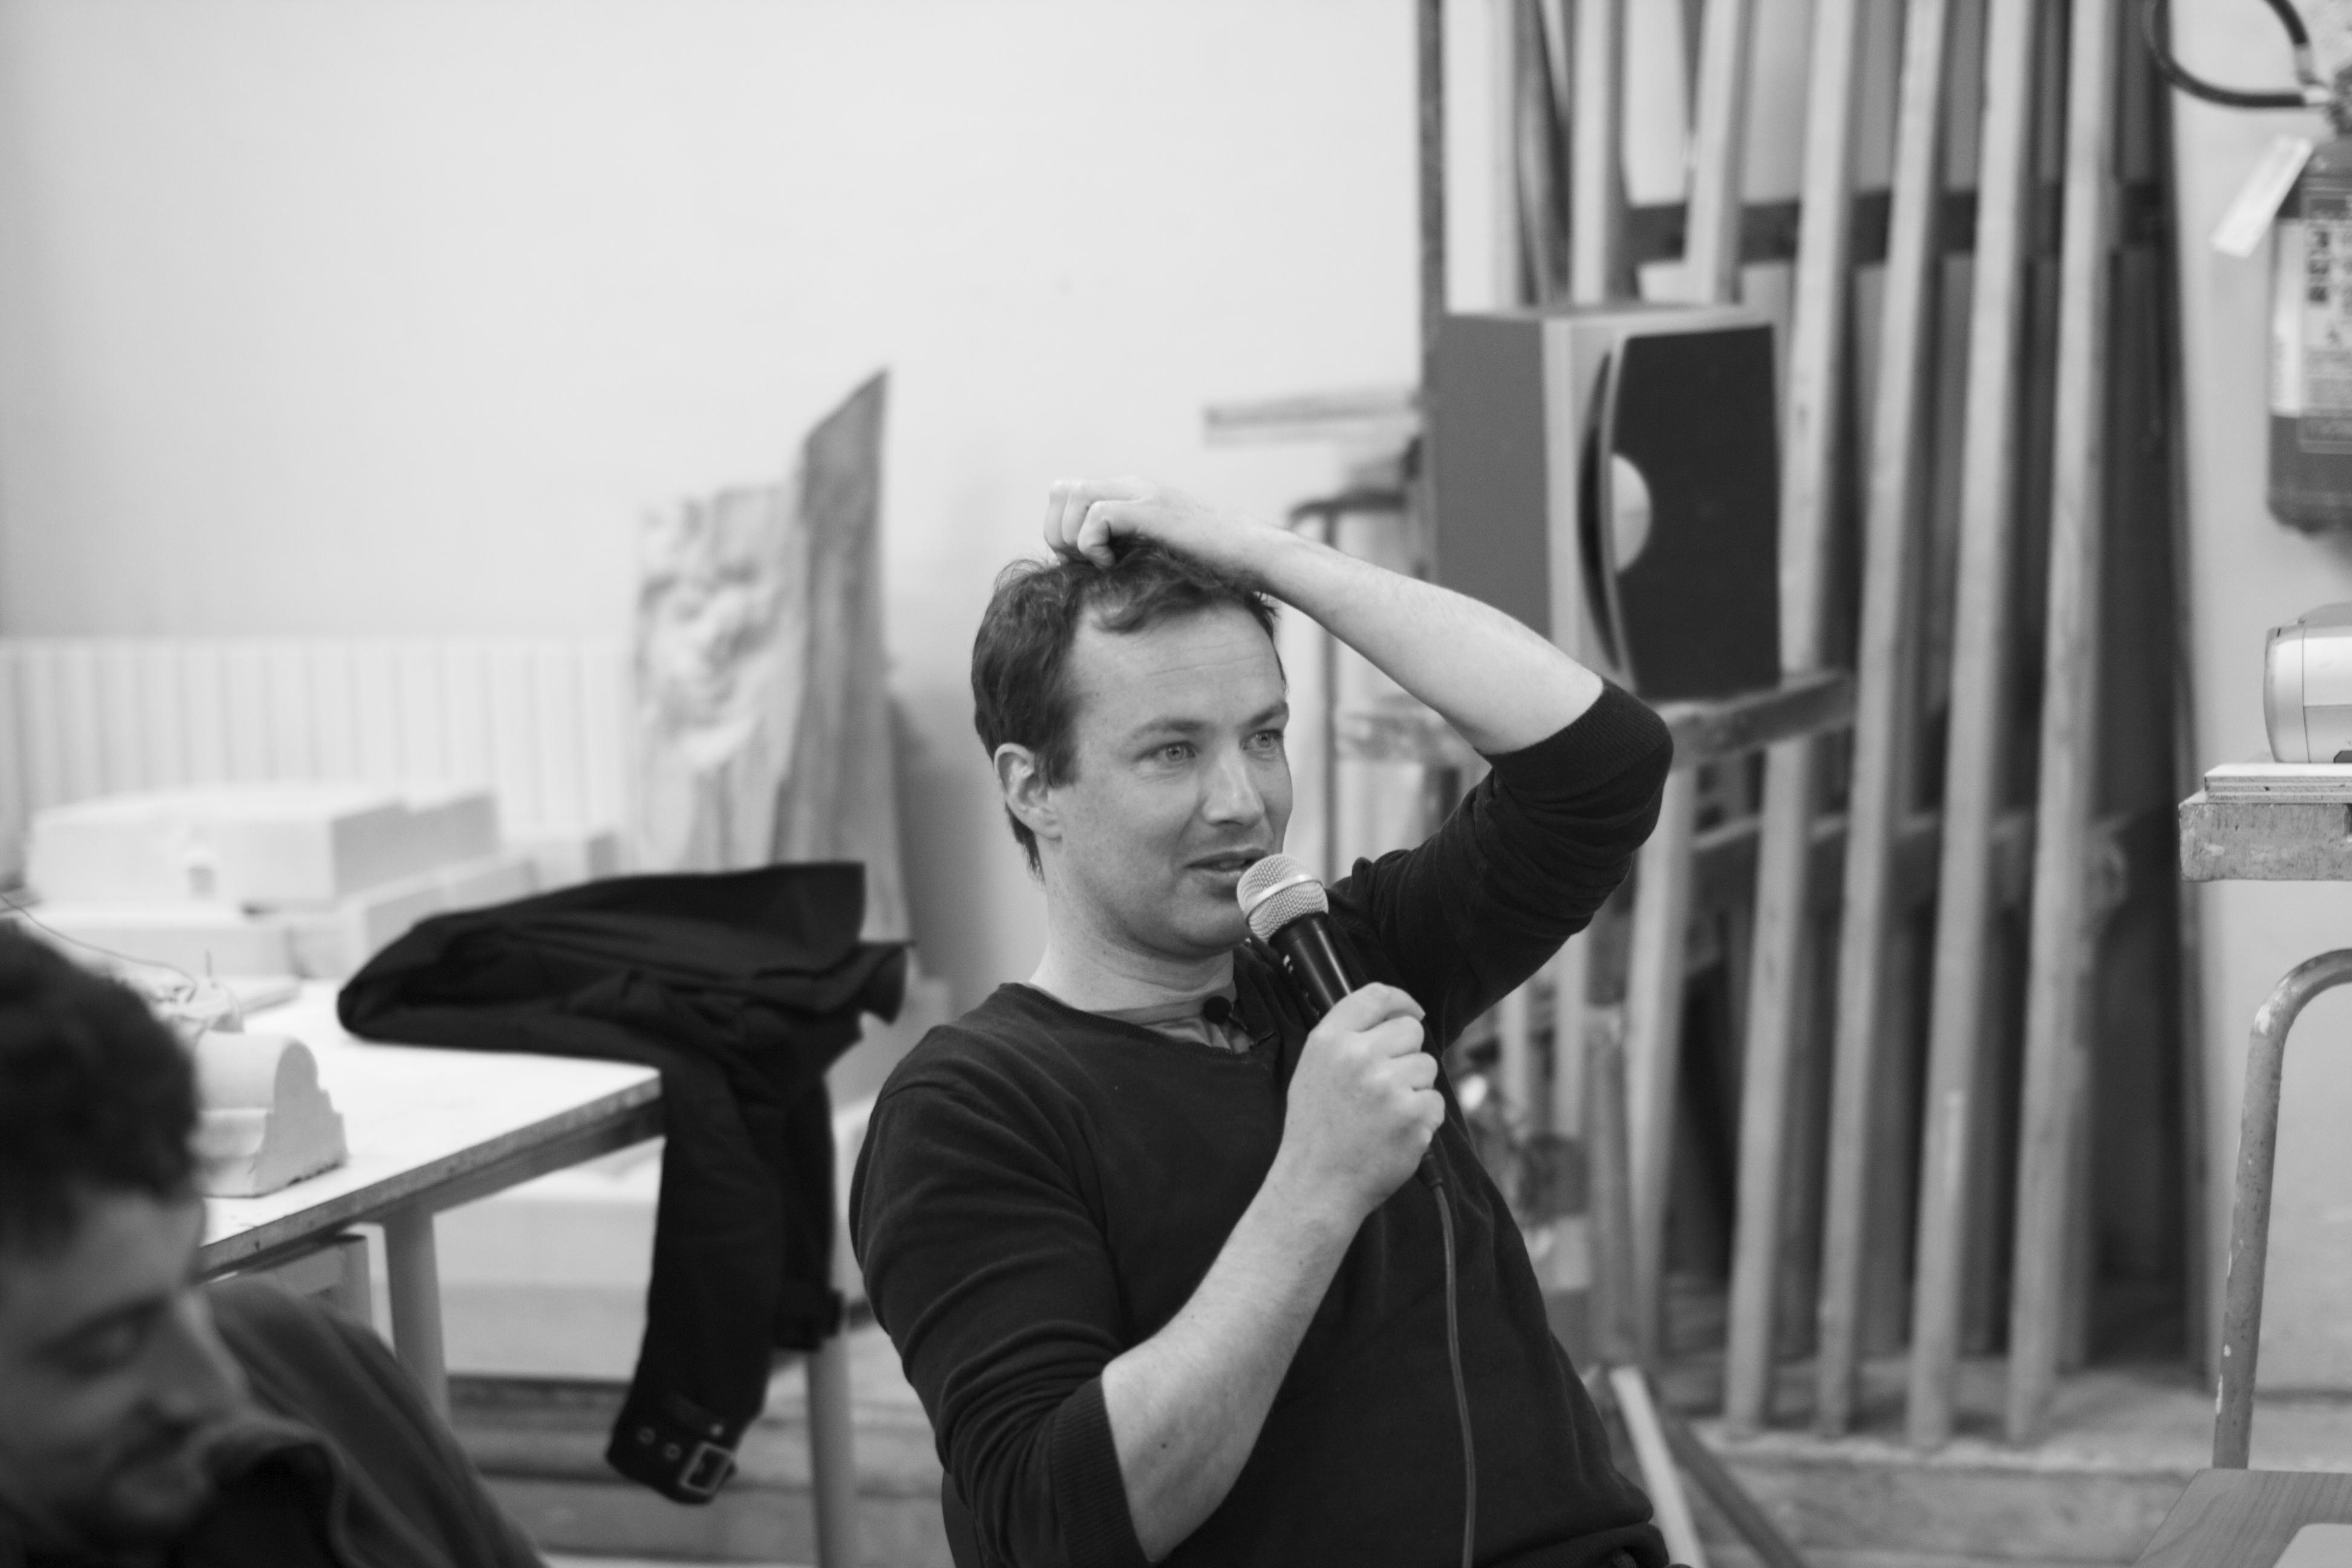 Flickr - Aron Demetz - Dialoghi e materia - Workshop a cura di Franco Reina16